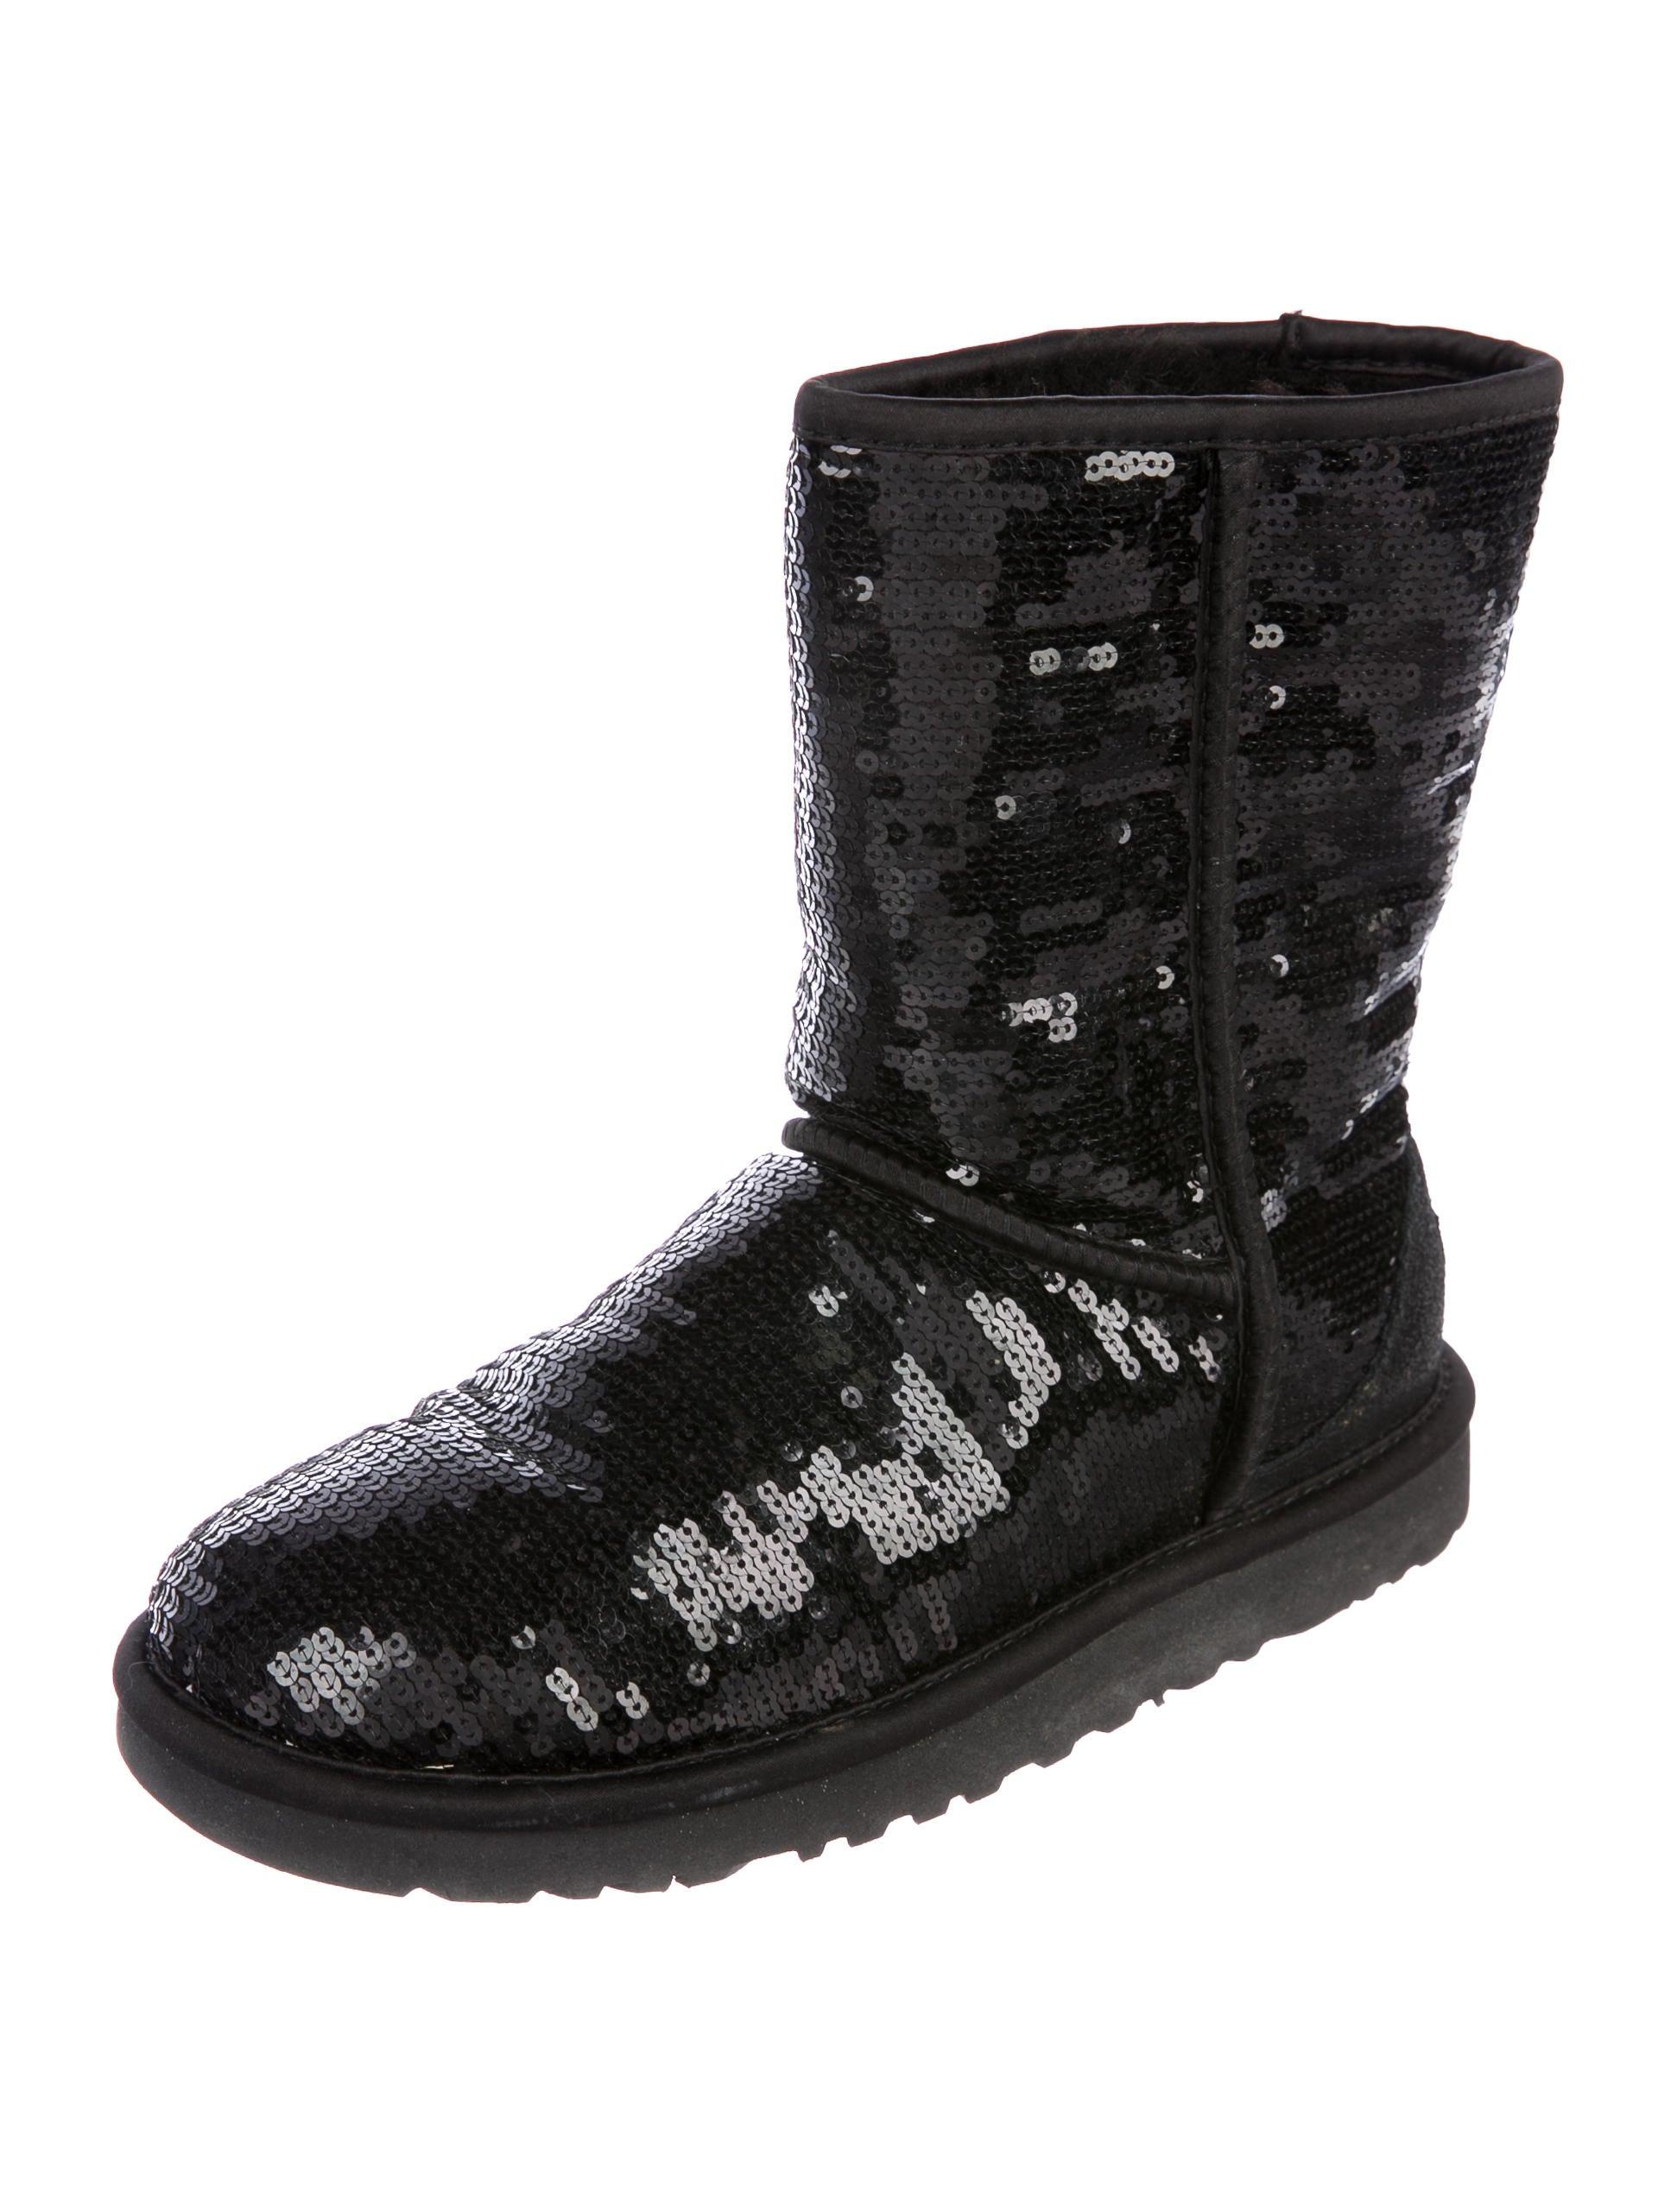 UGG Australia Shearling Embellished Boots sast cheap price J8WxTzBP